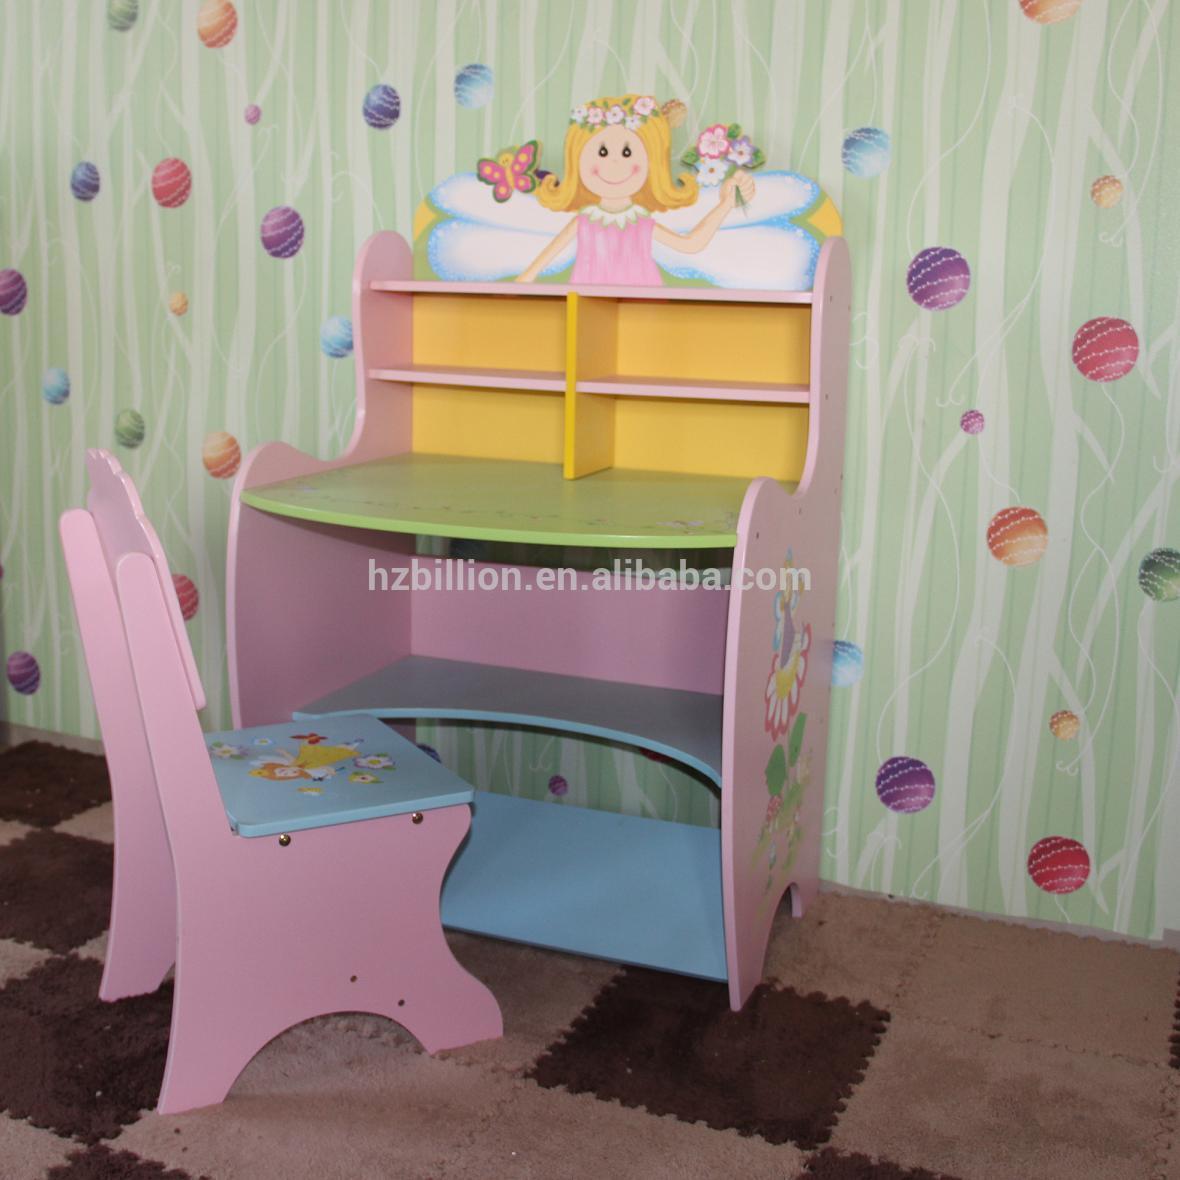 3 12 a os de madera mesa de estudio los ni os con silla - Mesas de estudio para ninos ...